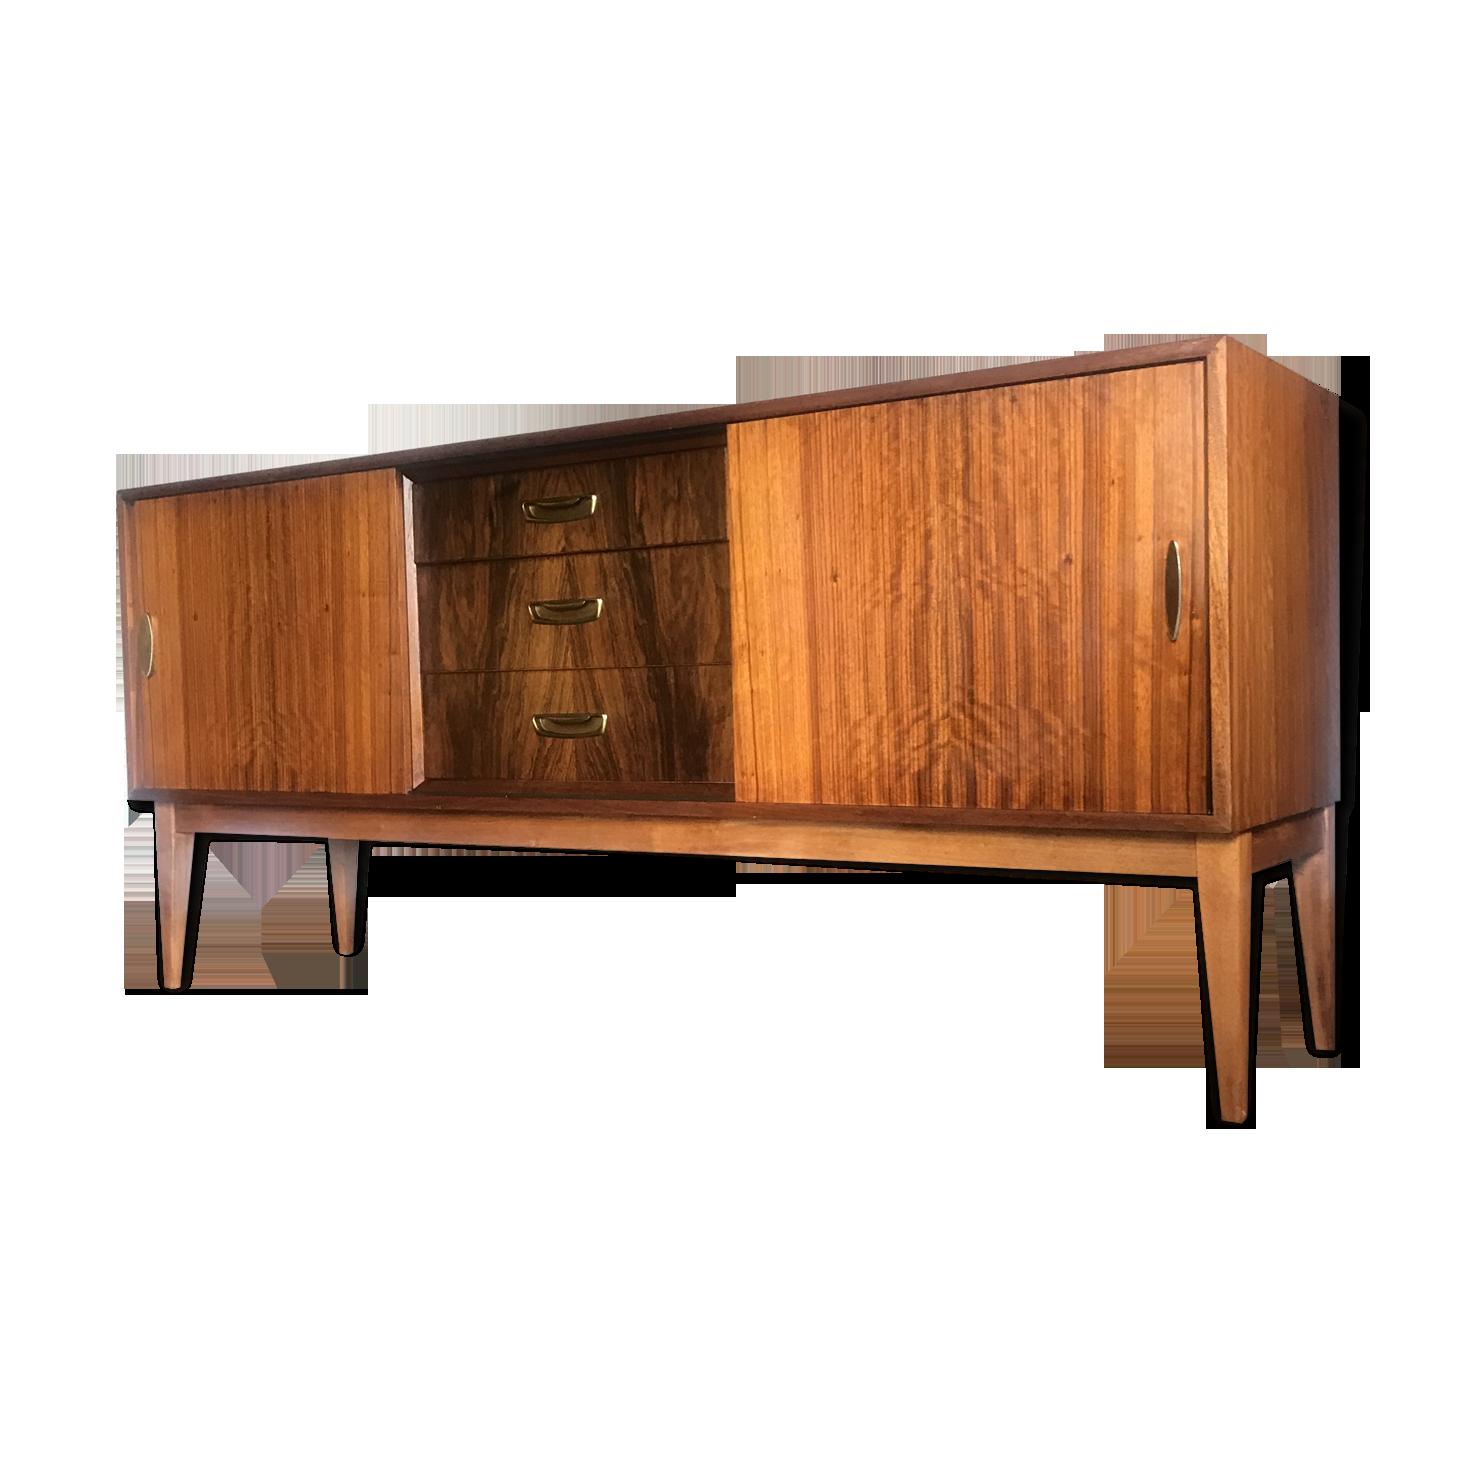 Danish Credenza Walnut : Credenza mid century modern sideboard buffet with glass display